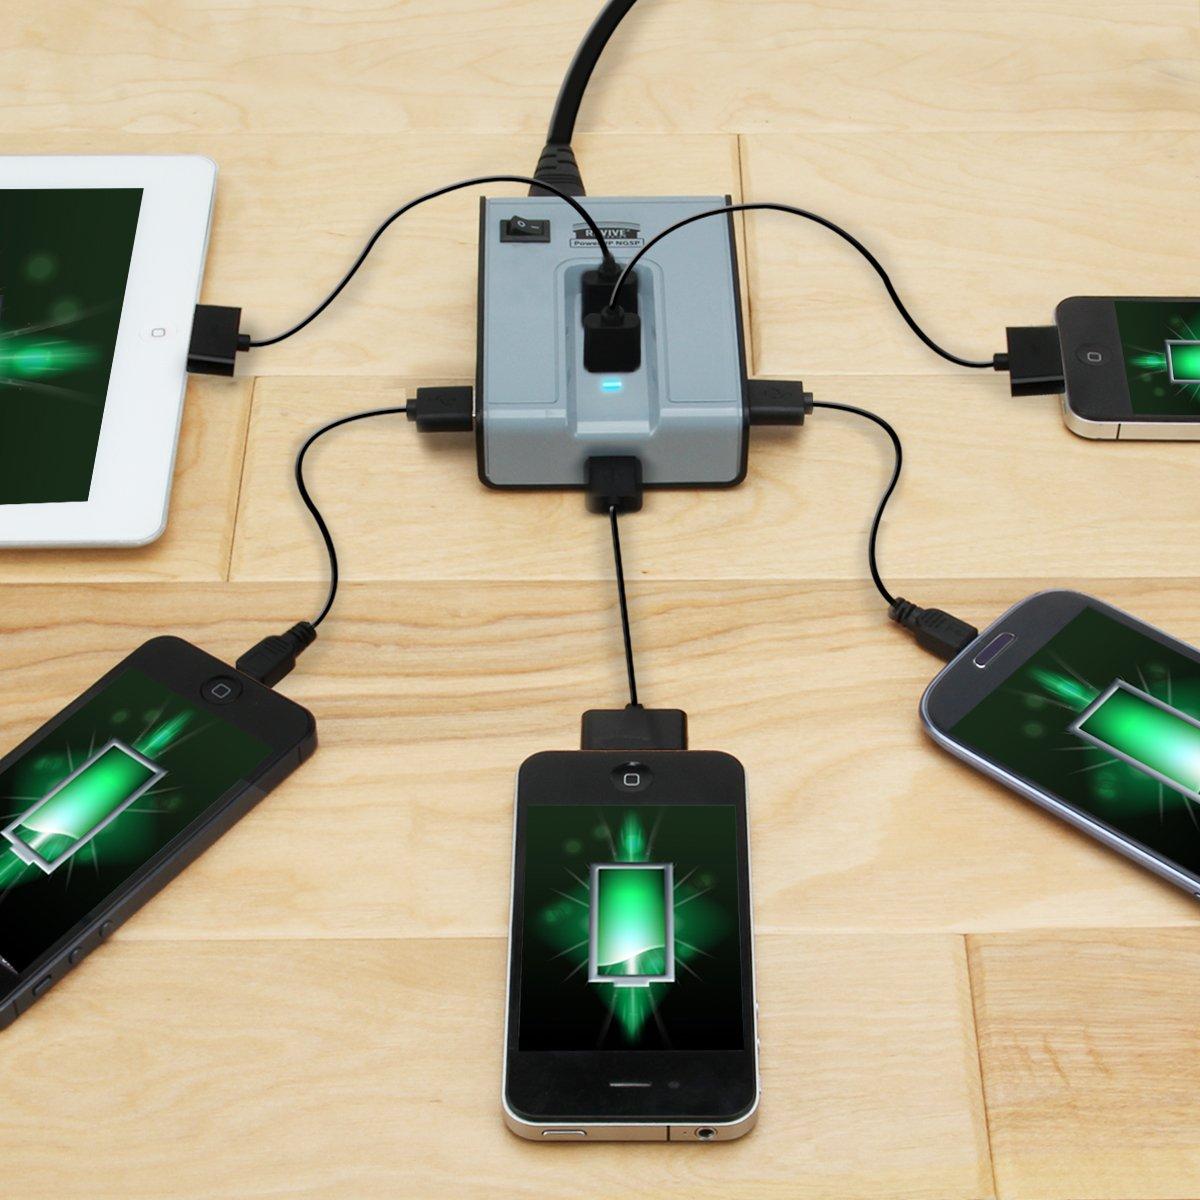 Amazon.com: ReVIVE PowerUP NG5P 5-Port USB Desktop Charging Station ...